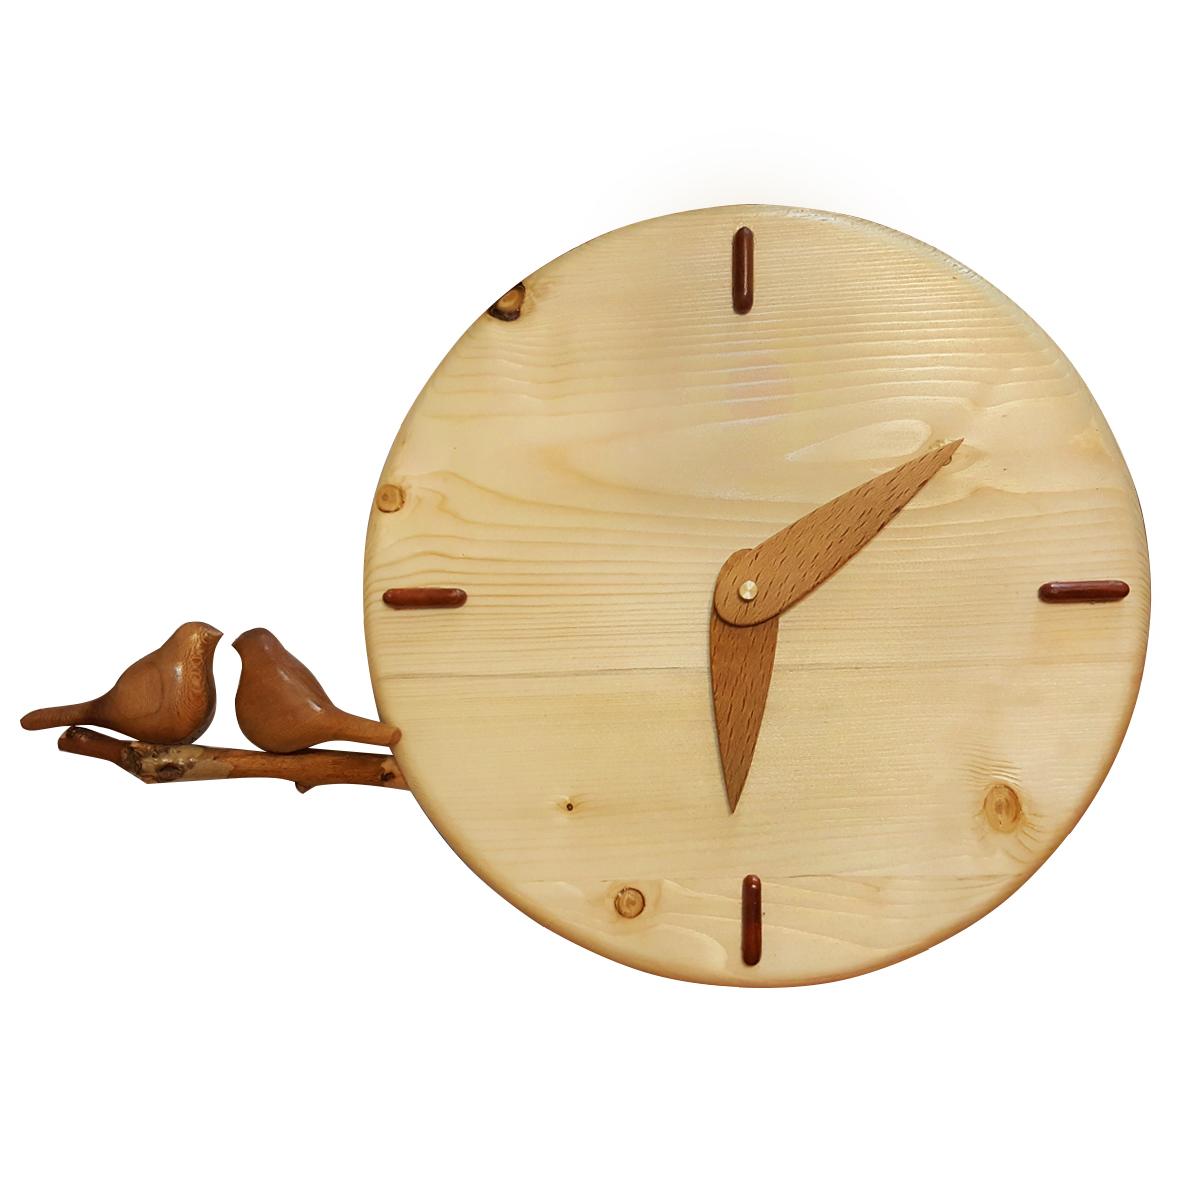 ساعت دیواری مدل گنجشک کد 410